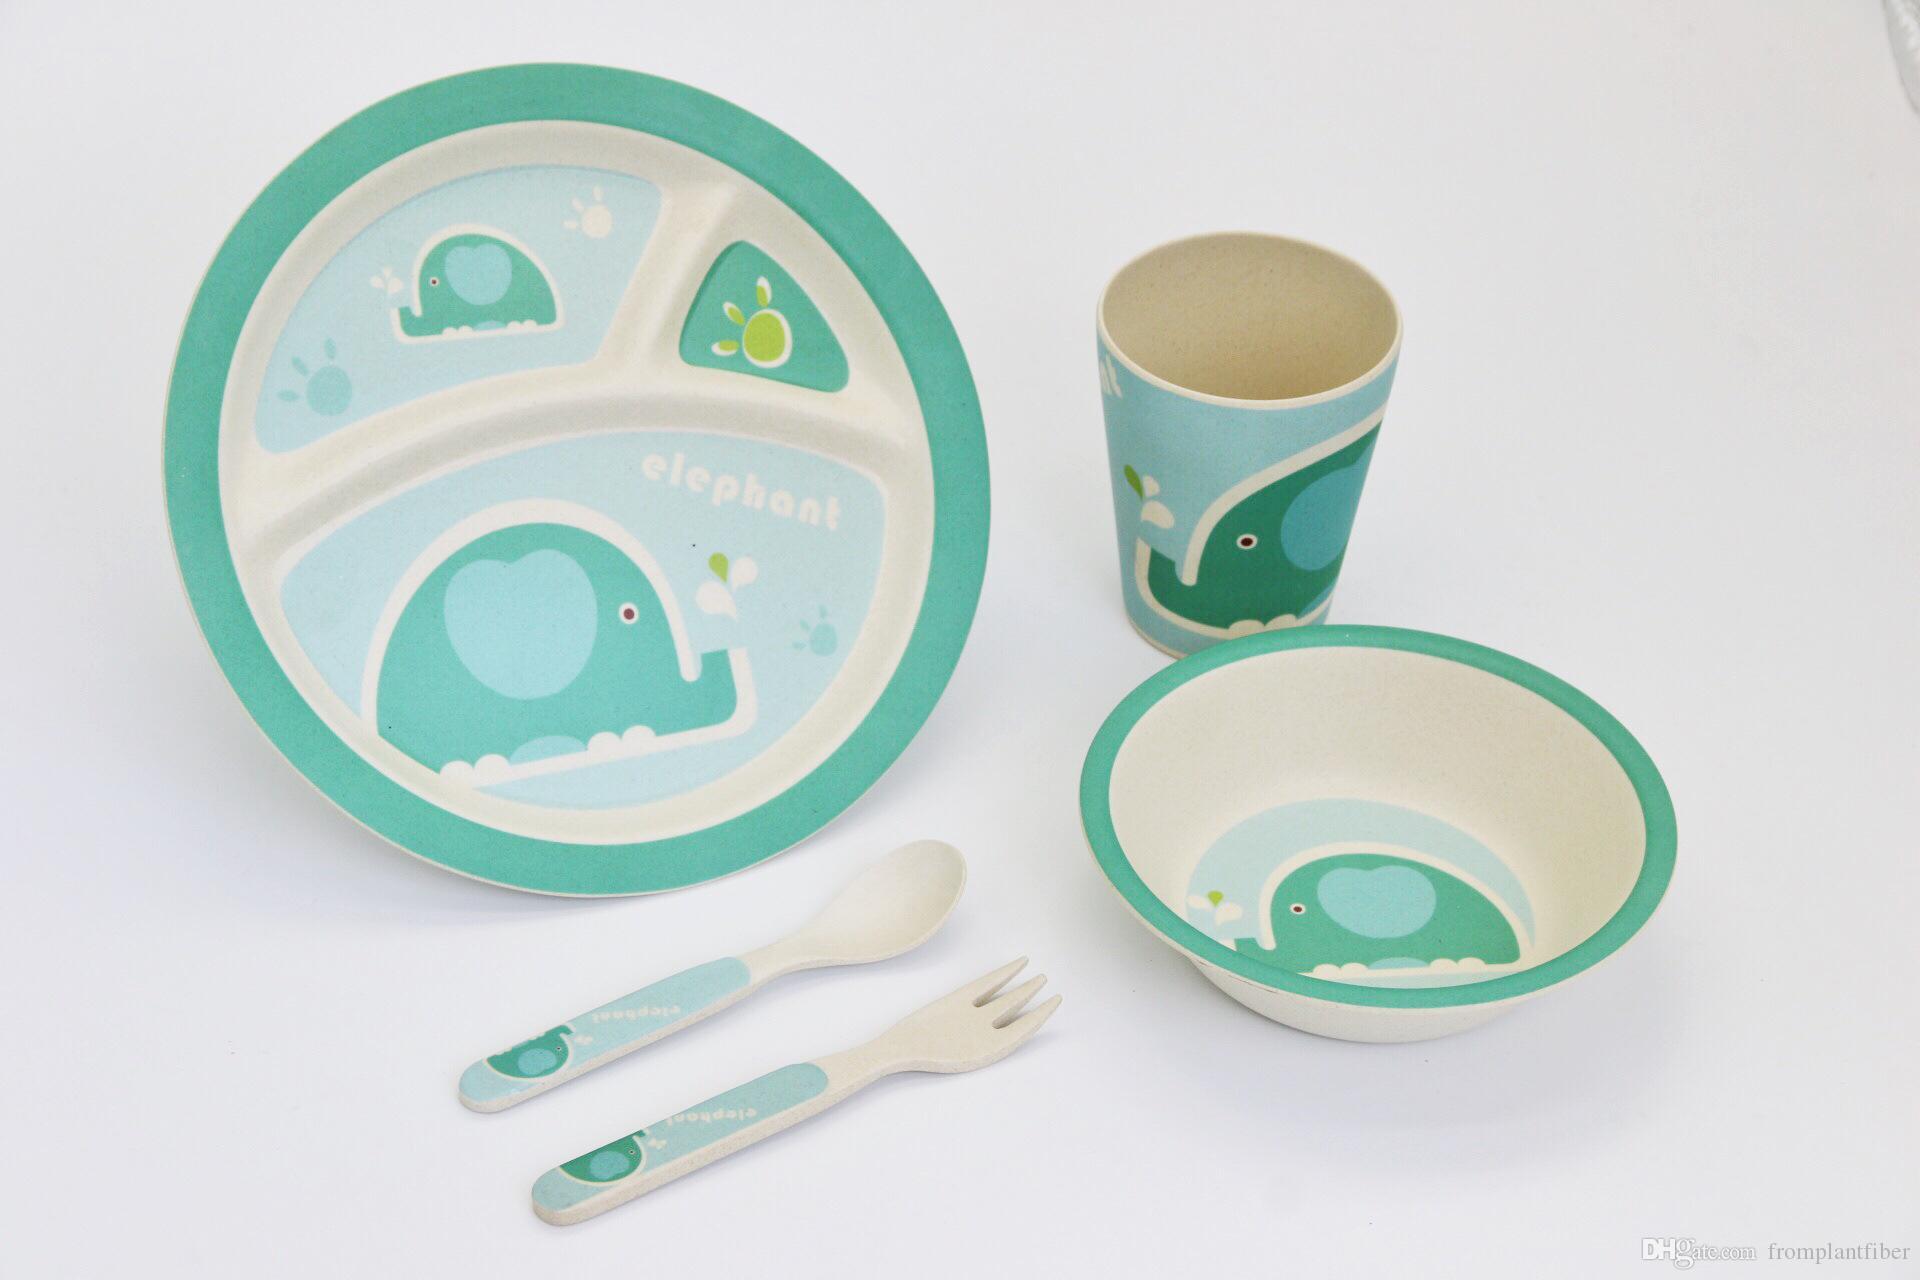 Camping Vaisselle picknickset Pique-Vaisselle 4 Personnes Bambou Turquoise